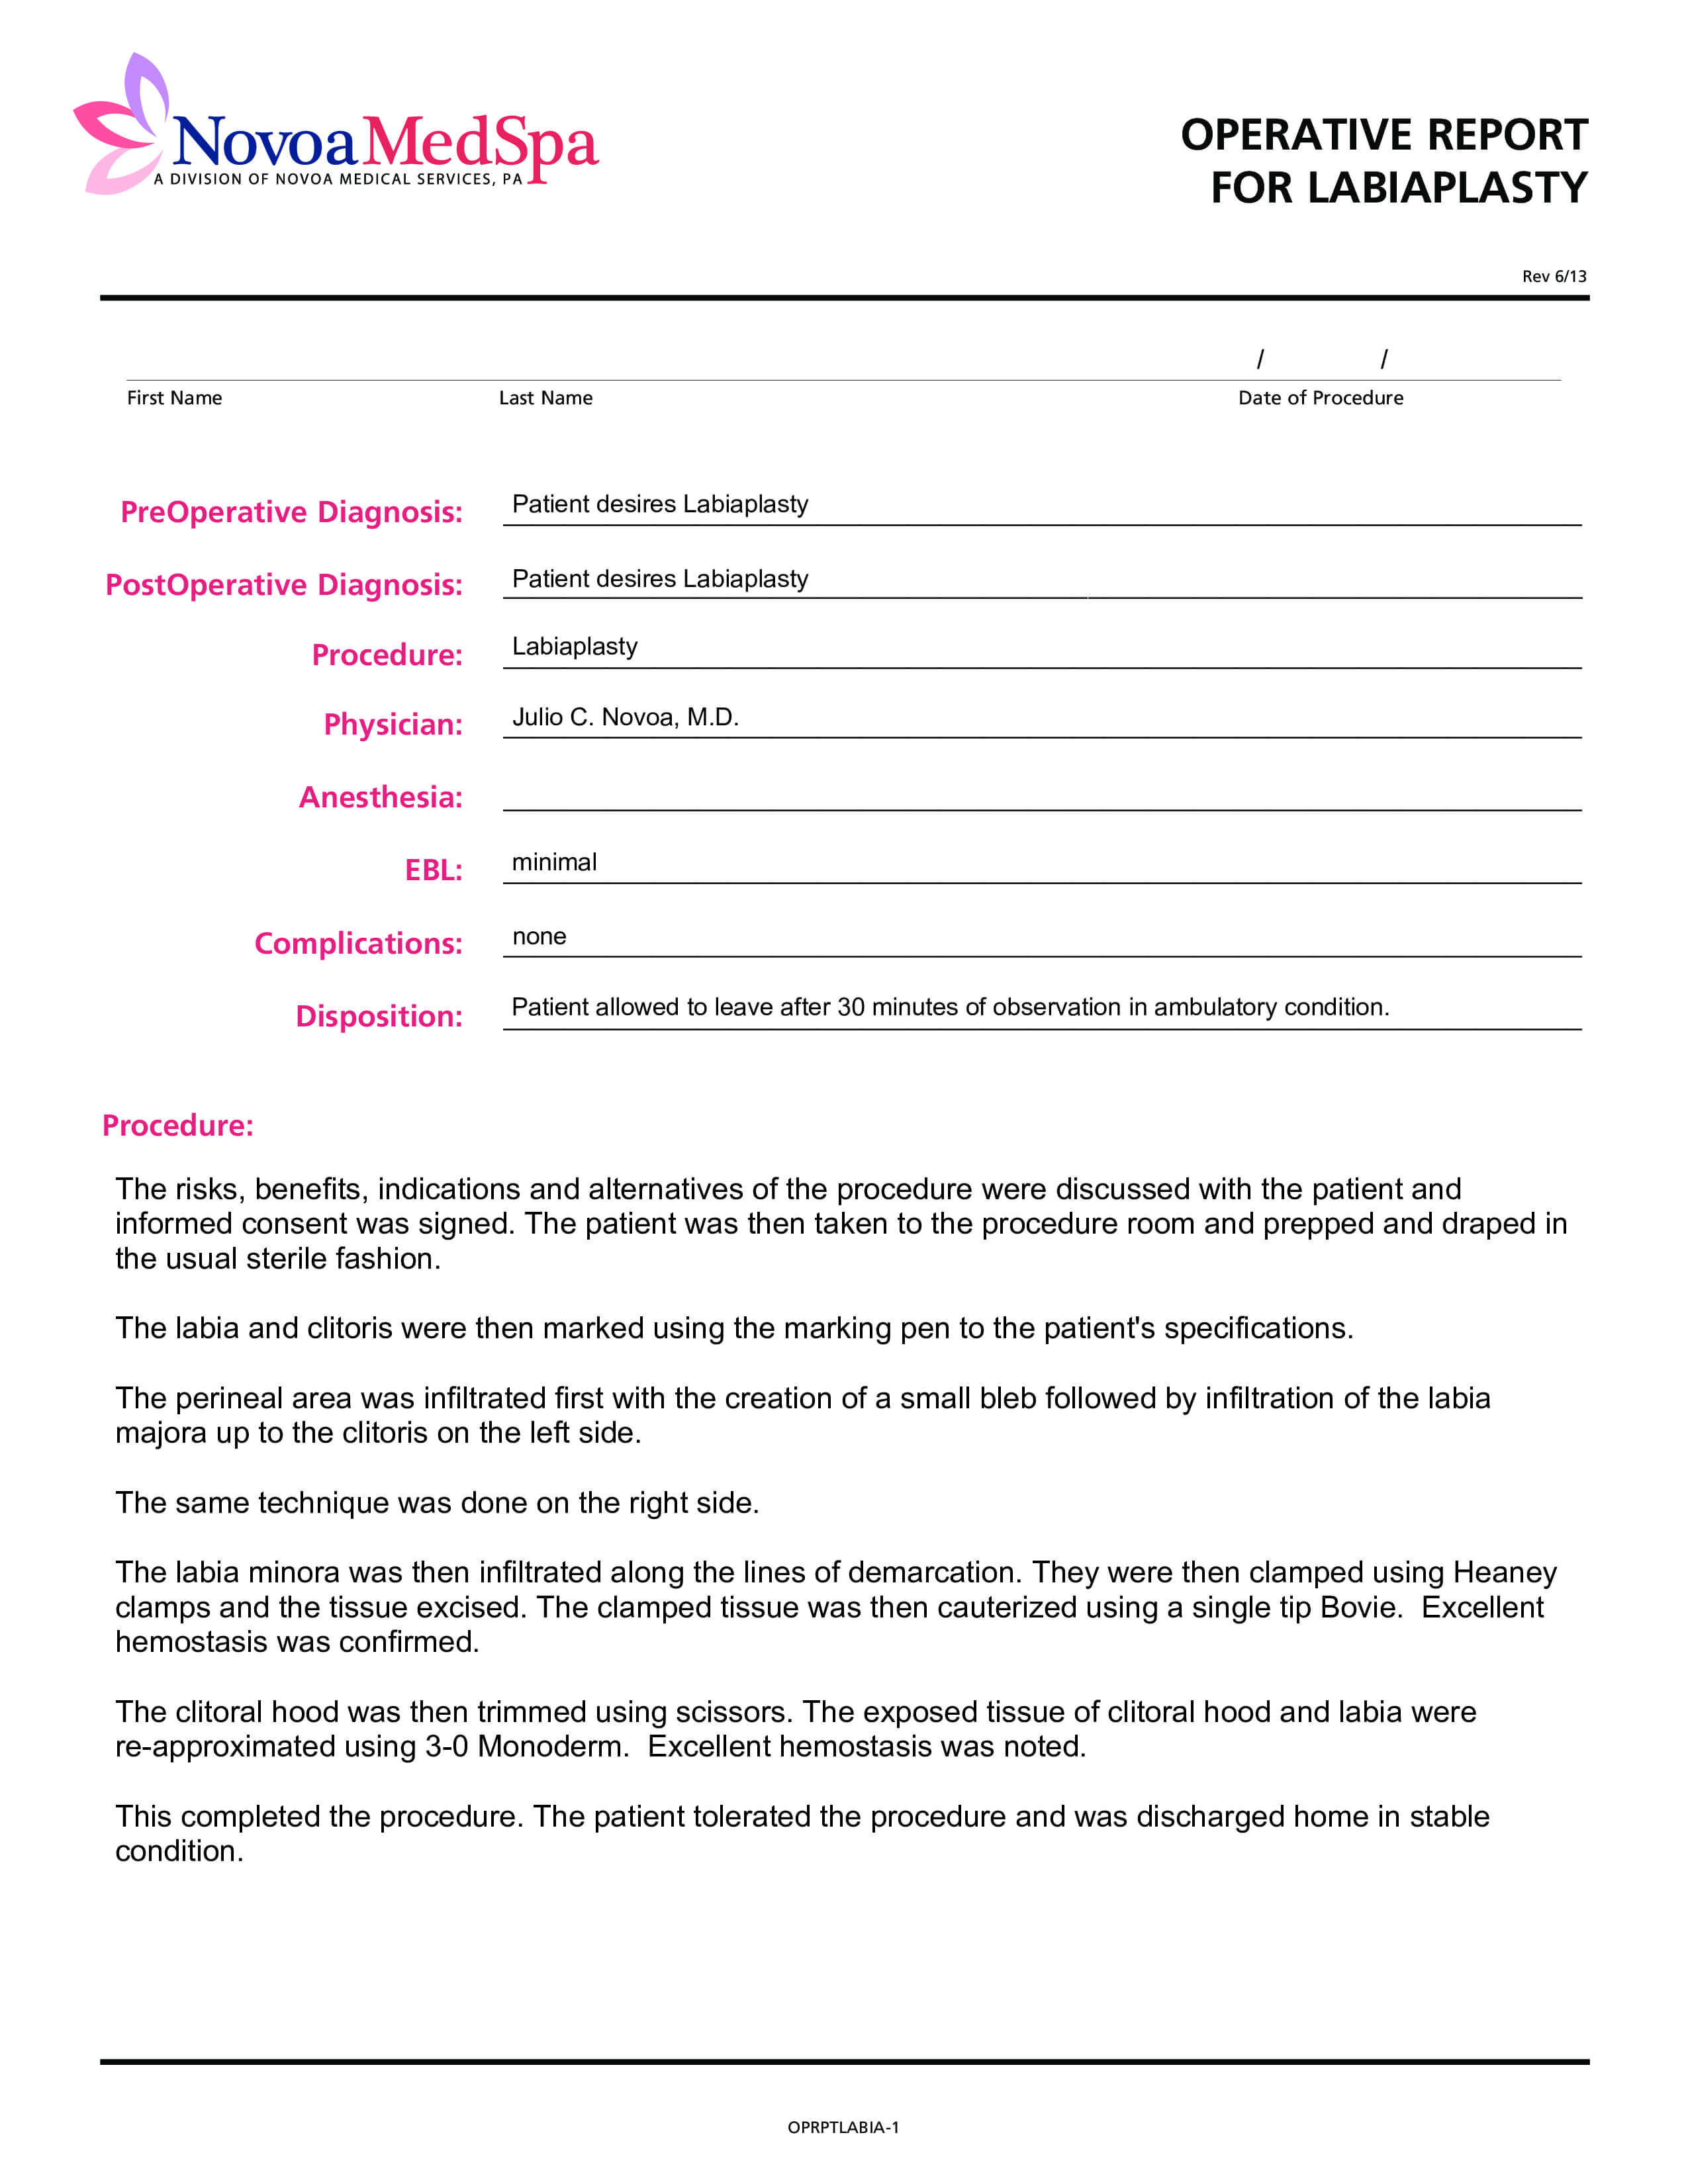 Operative Report | Templates At Allbusinesstemplates throughout Operative Report Template